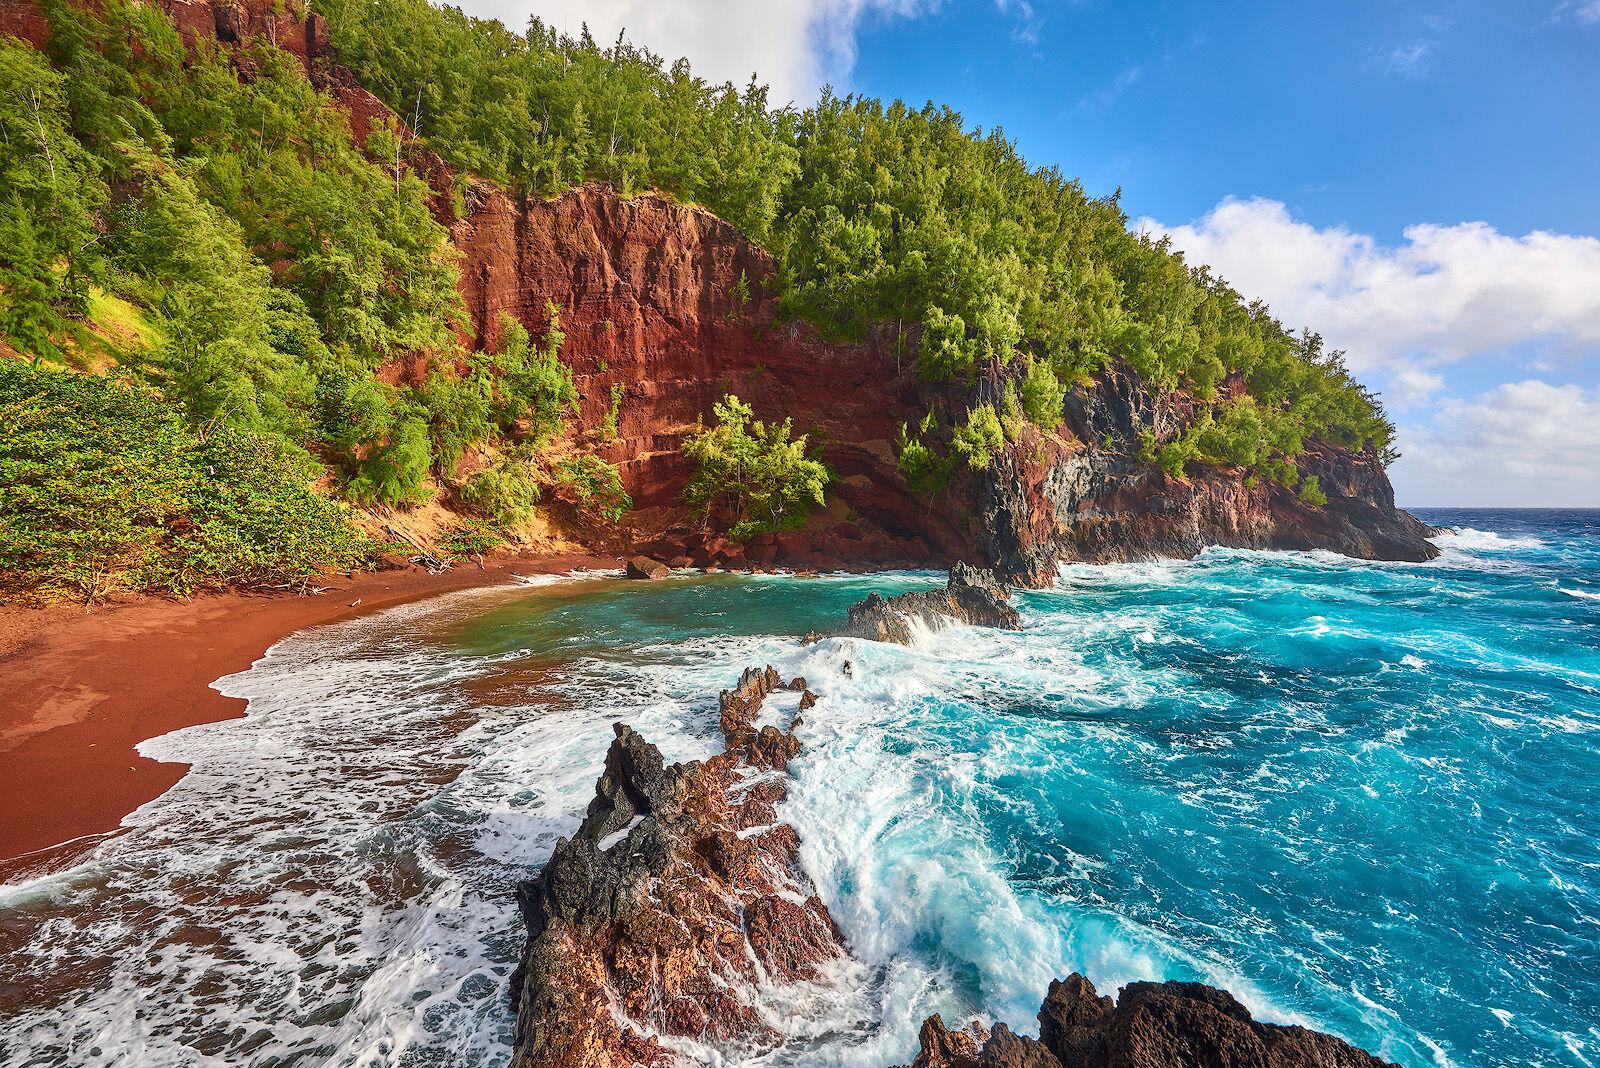 an amazing red sand beach with incoming aqua blue waves located in Hana, Hawaii on the island of Maui